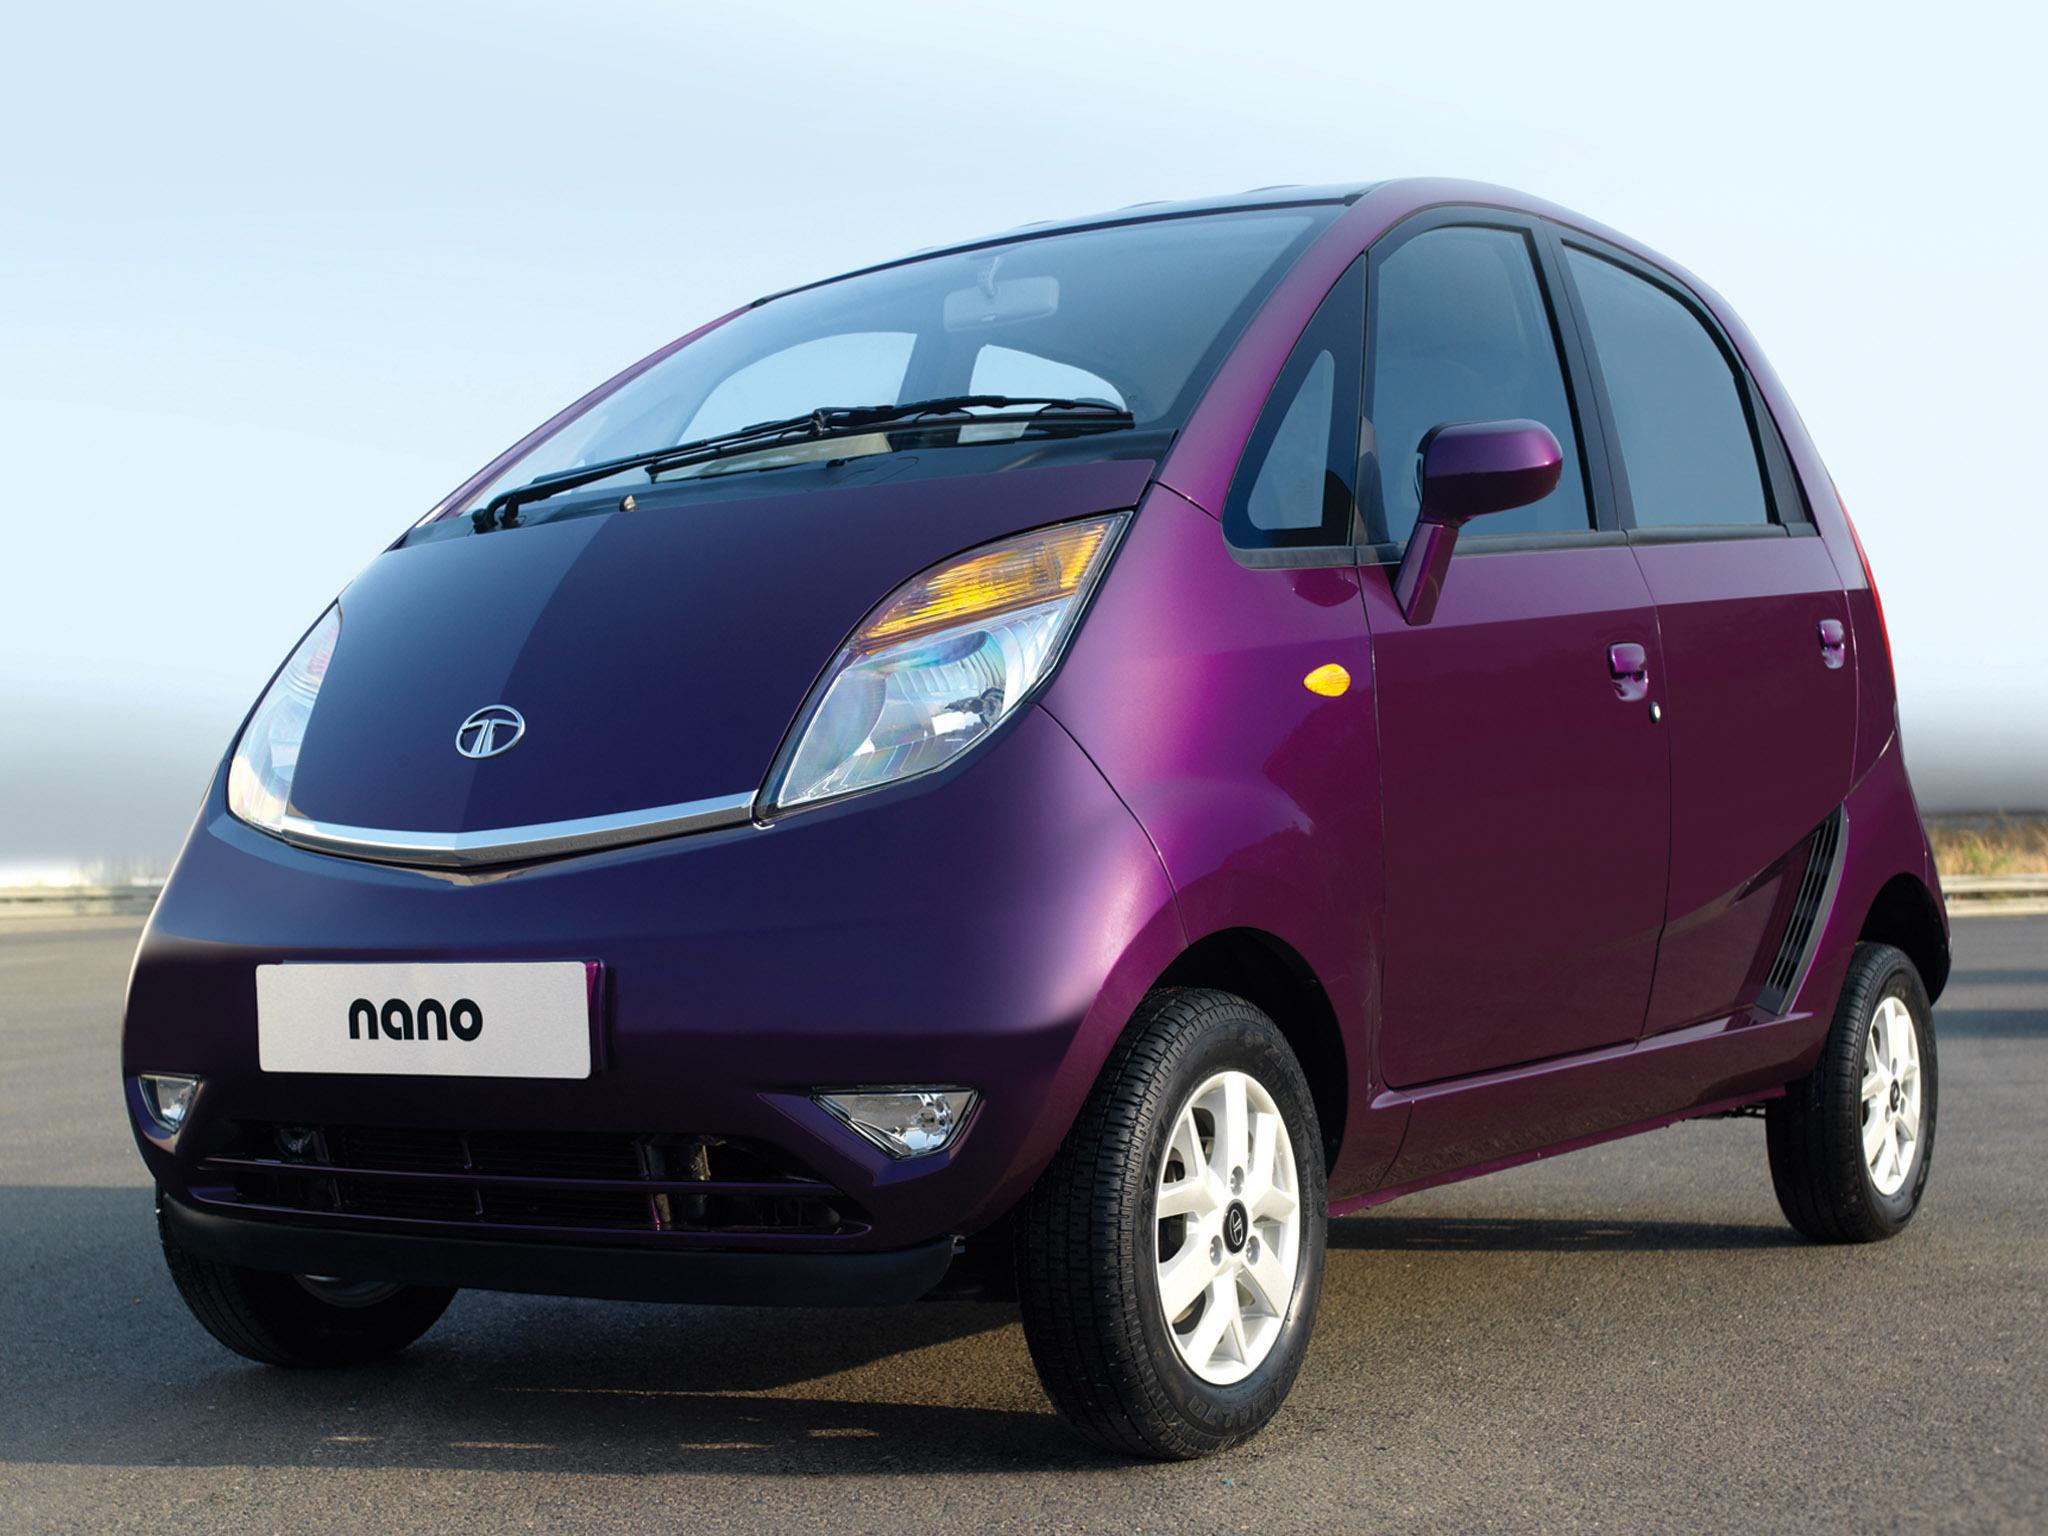 Design of tata nano car - Design Car Tata Nano 2014